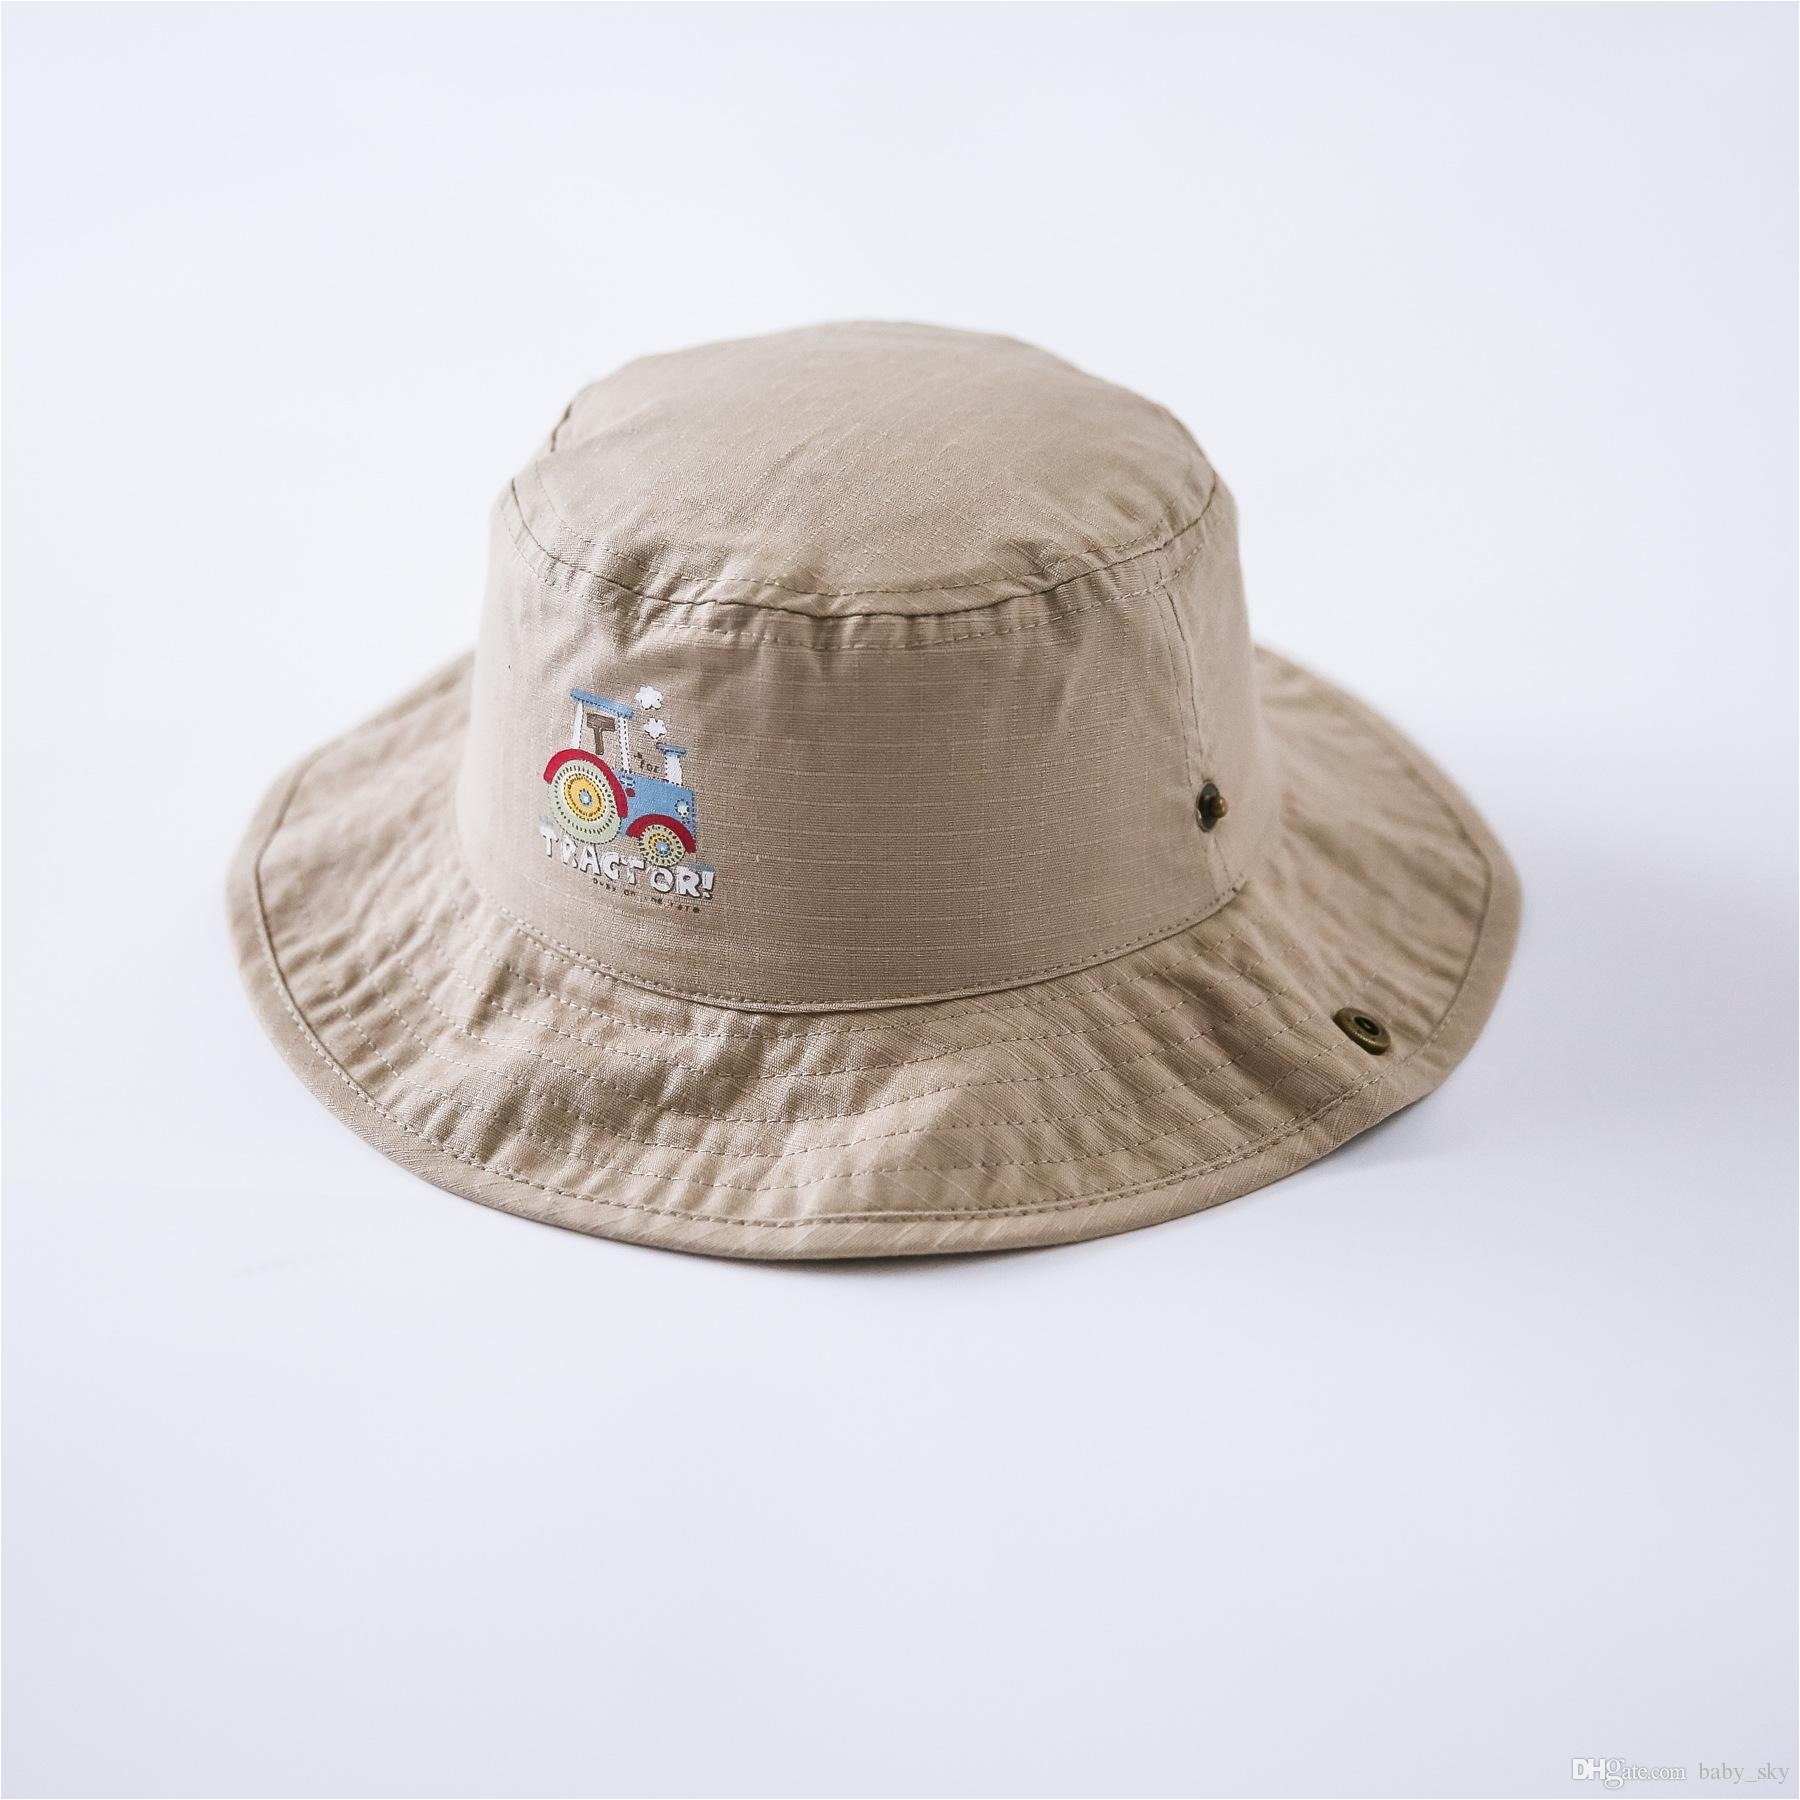 2018 kids fedora sun top hats baby caps brim khaki princess for girls fashion beach england vintage from baby sky 3 95 dhgate com